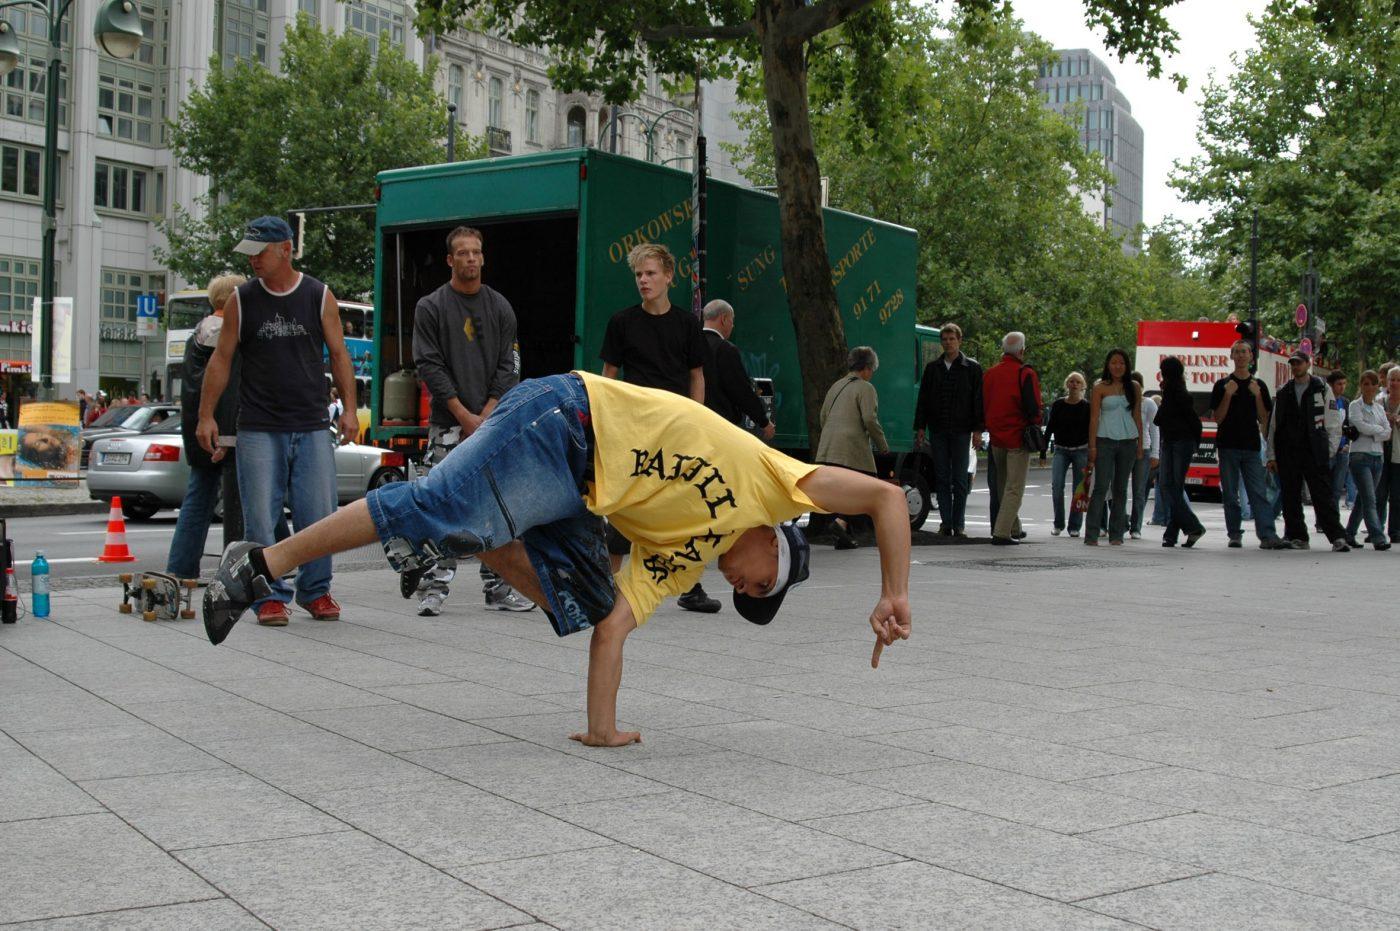 Dance-photographer-maripepa m